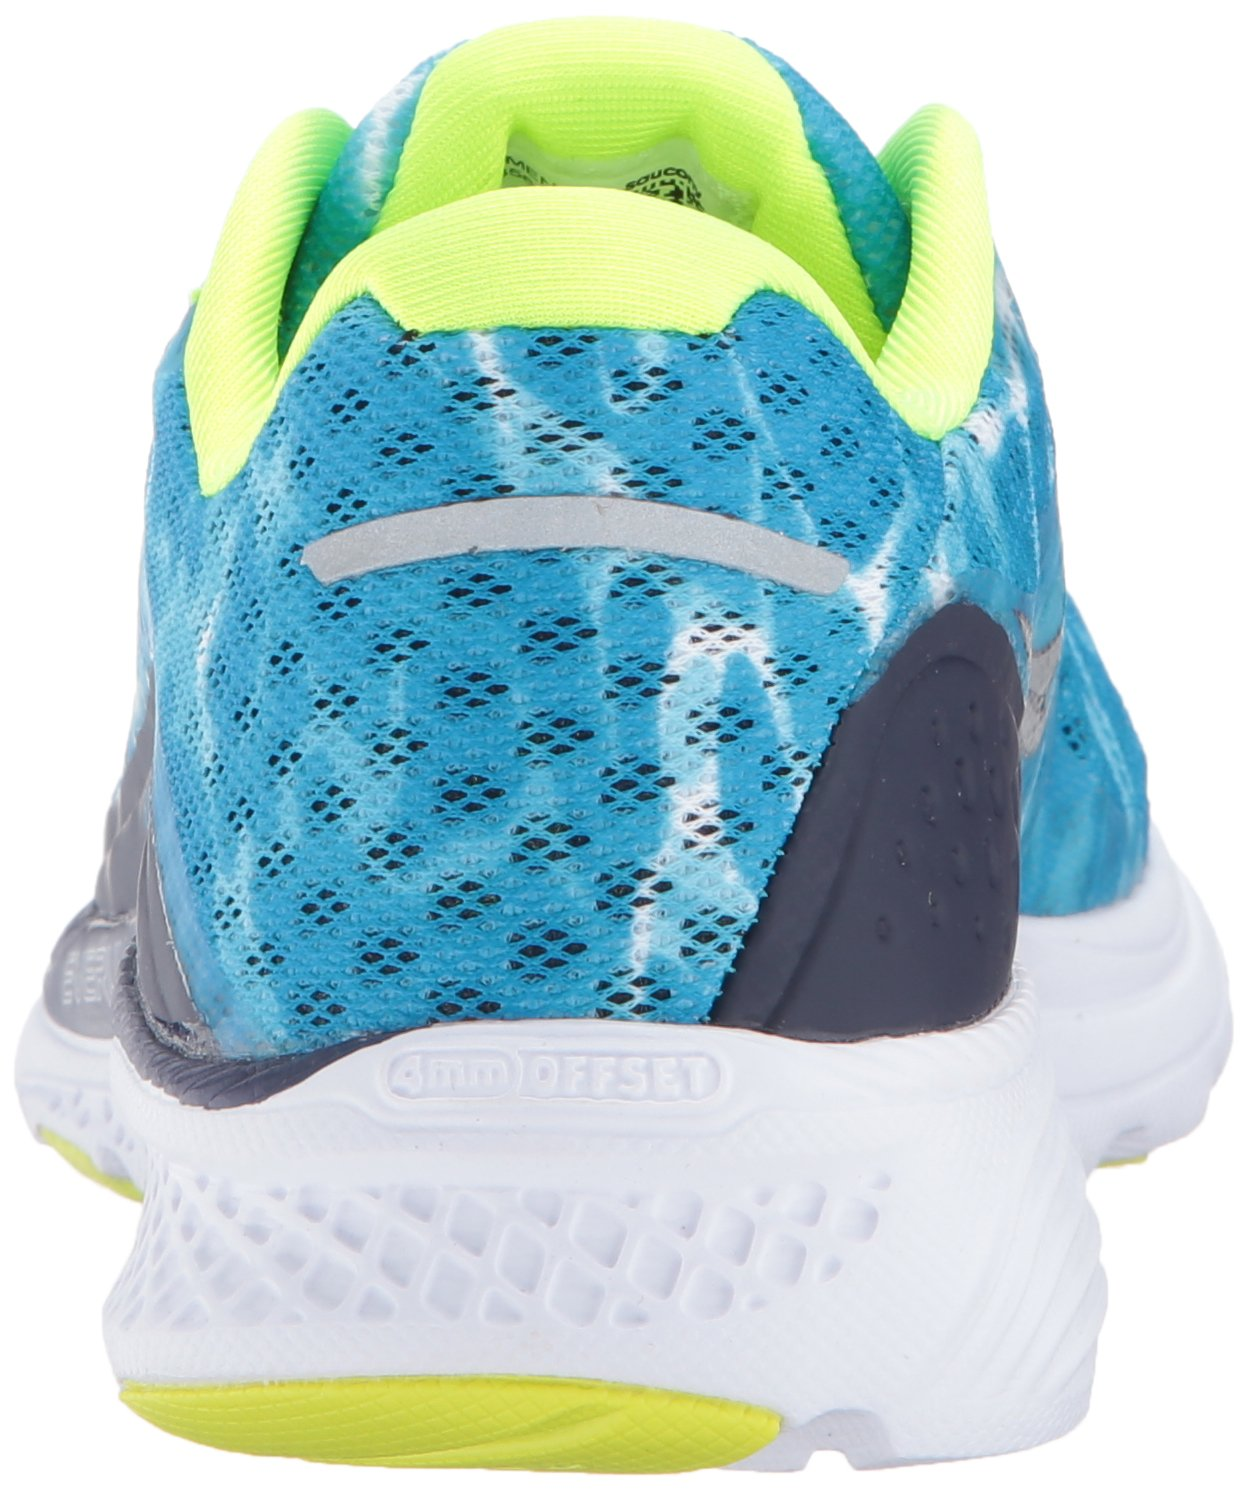 Saucony Women's Kinvara 8 Running Shoe B01N5I5CWD 5.5 B(M) US|Blue